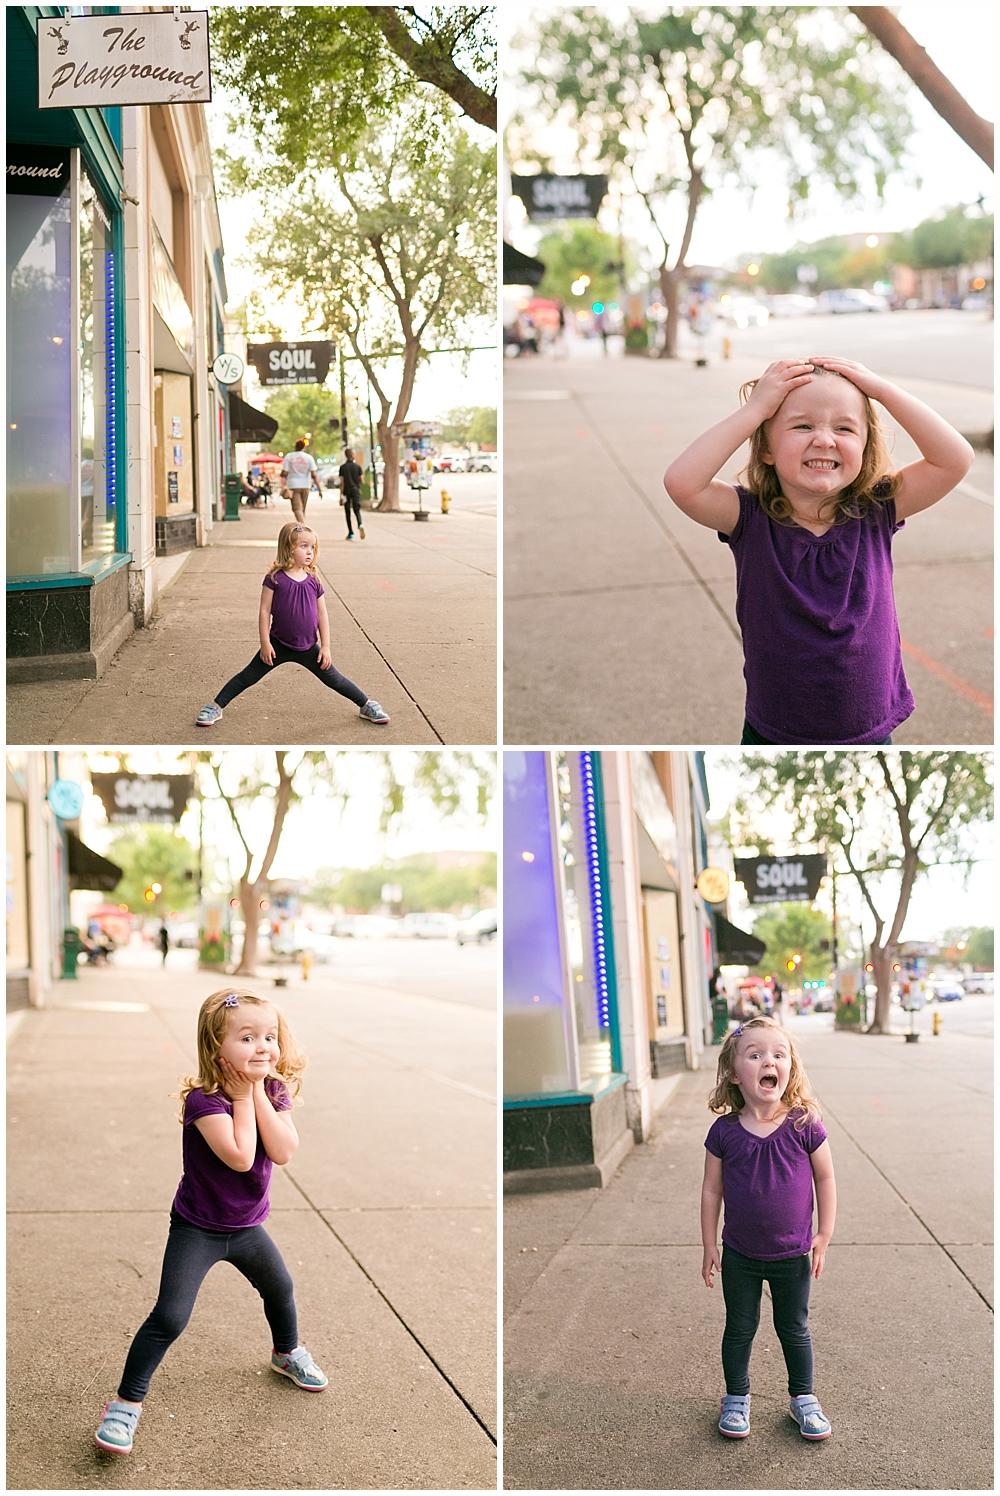 little girl being silly on sidewalk in August, Georgia